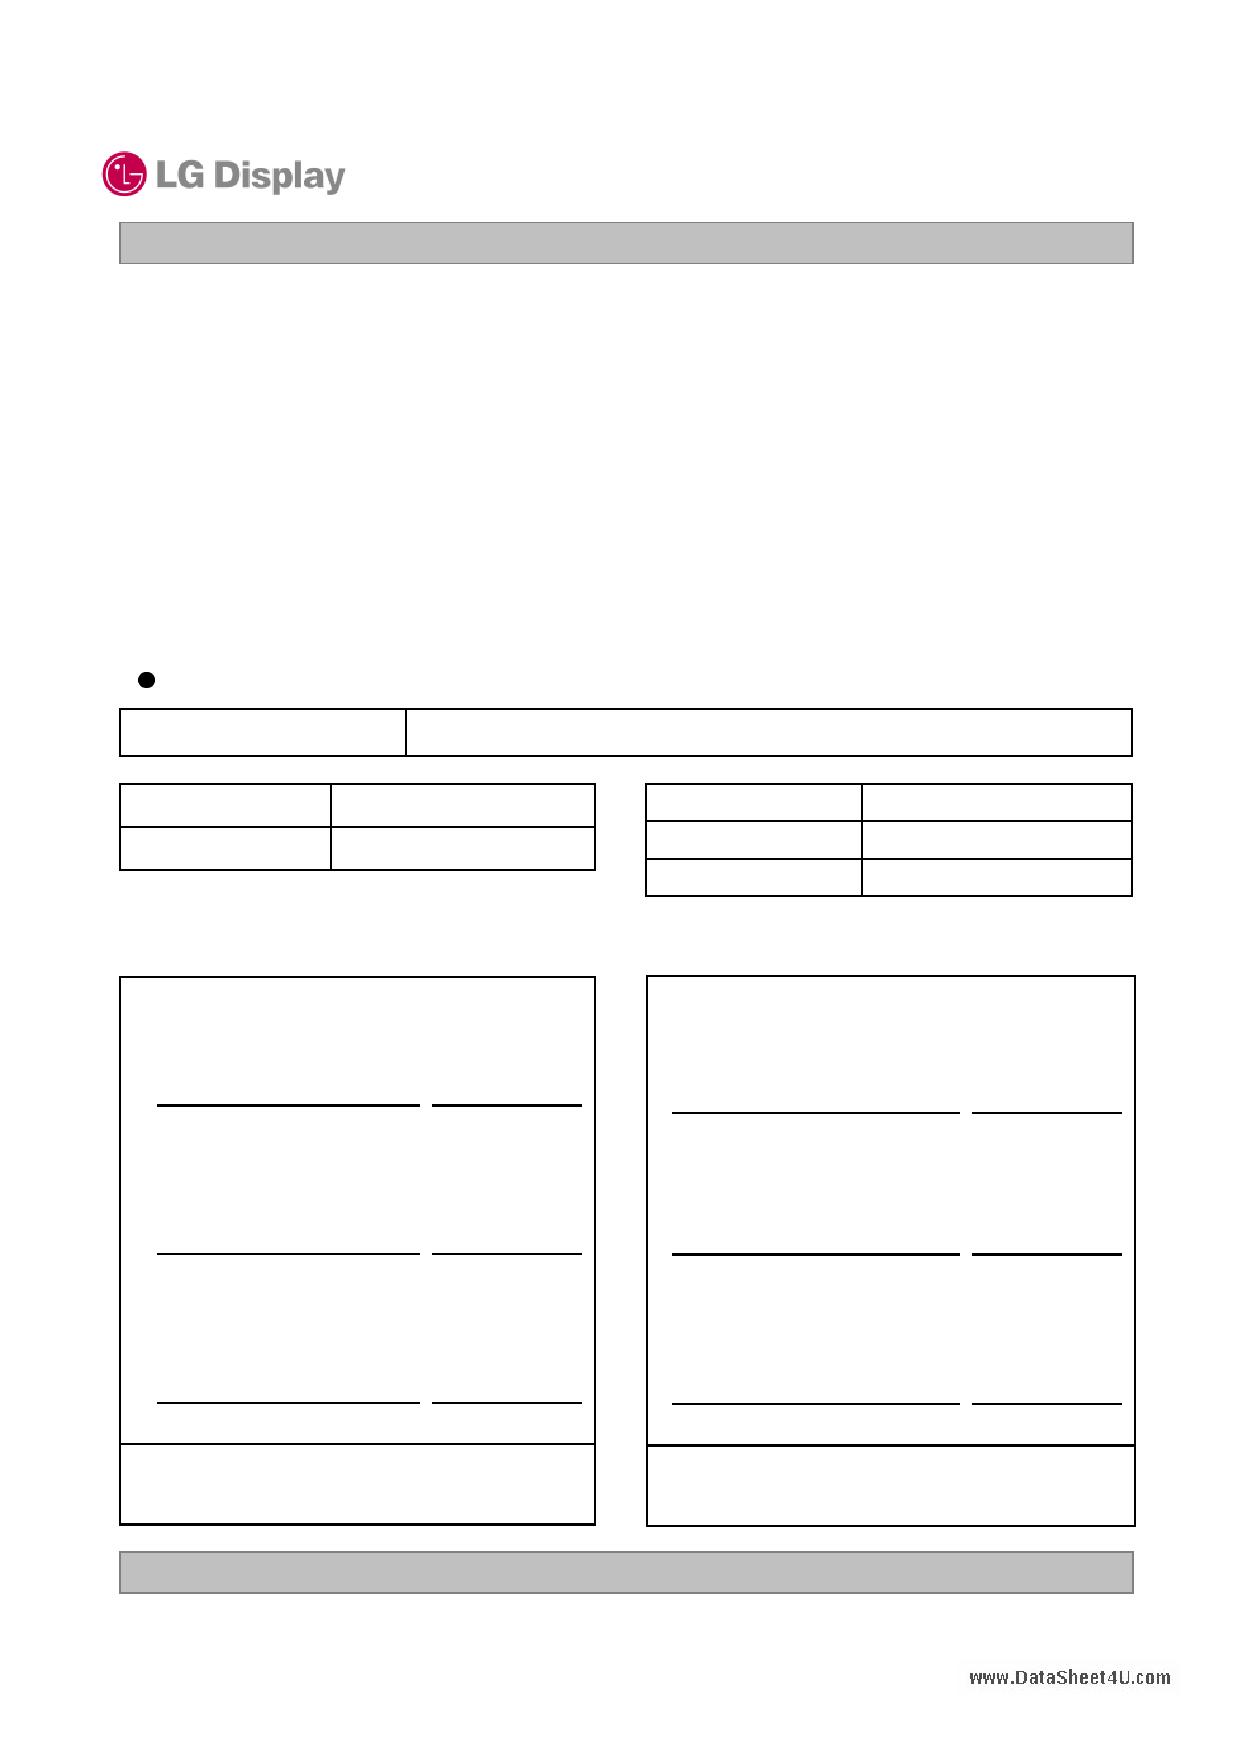 LD420WUB-SAA1 دیتاشیت PDF